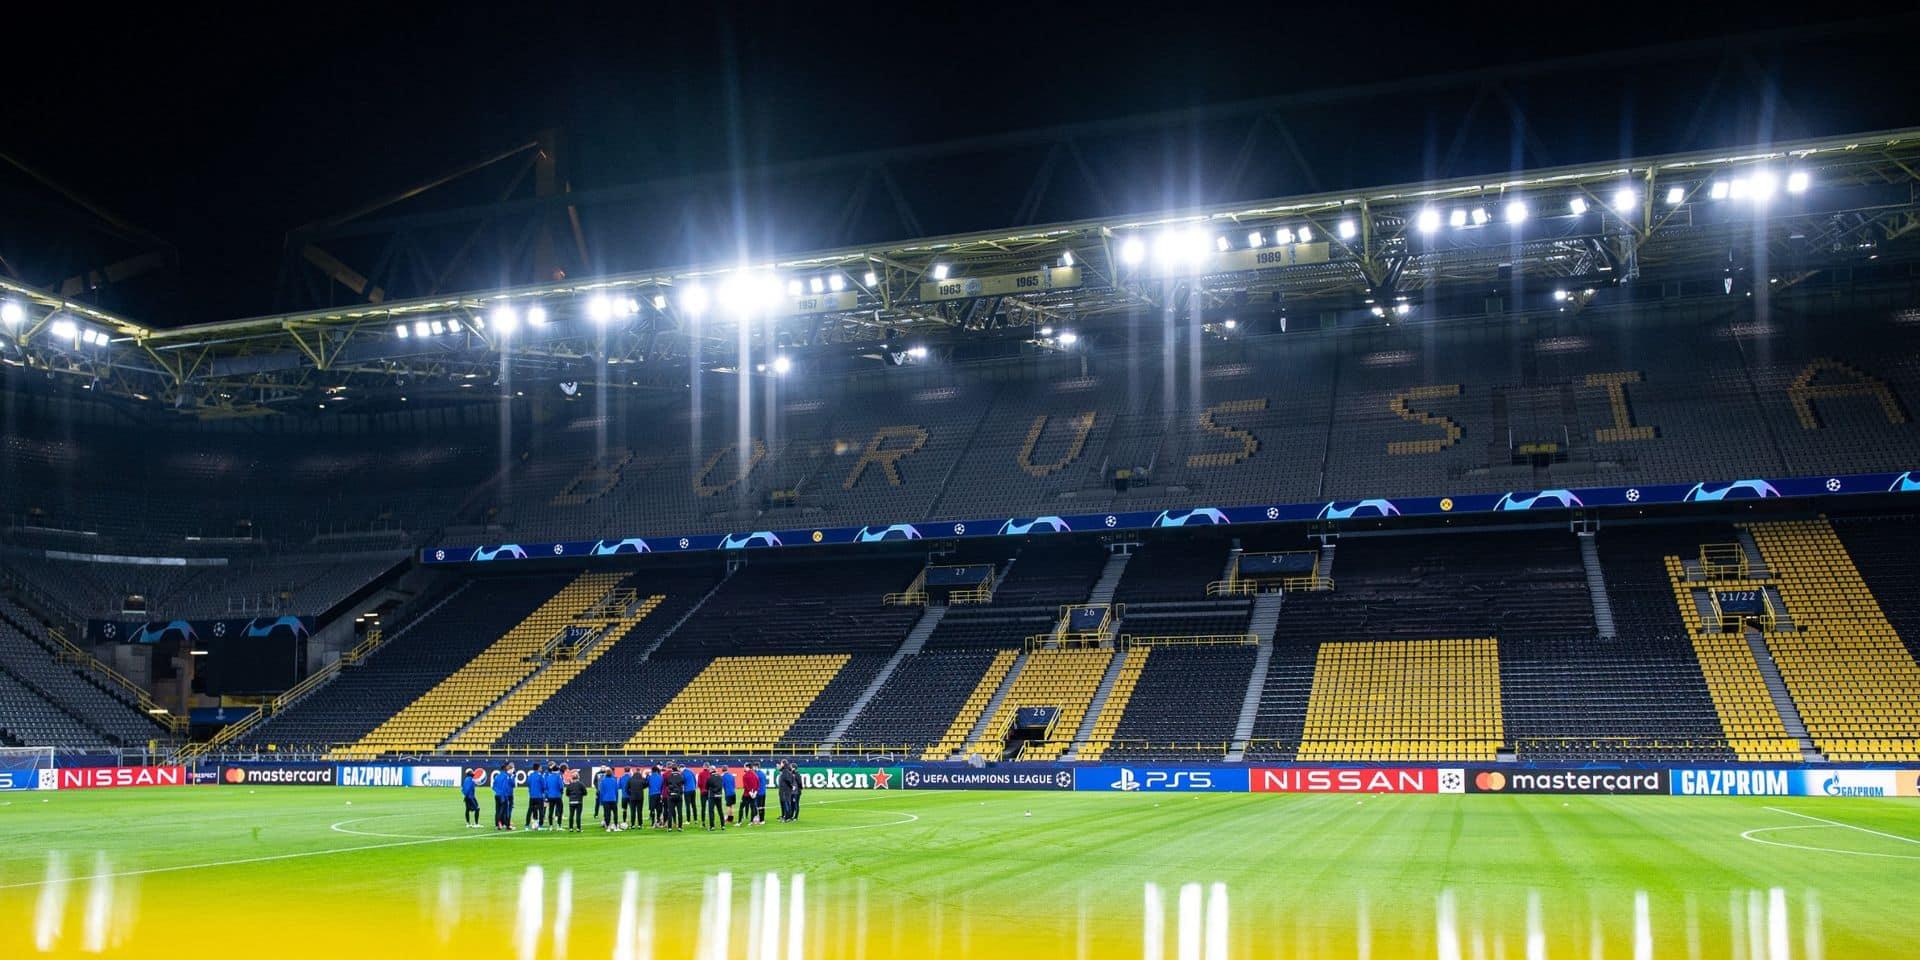 Liverpool affrontera Midtjylland à... Dortmund !